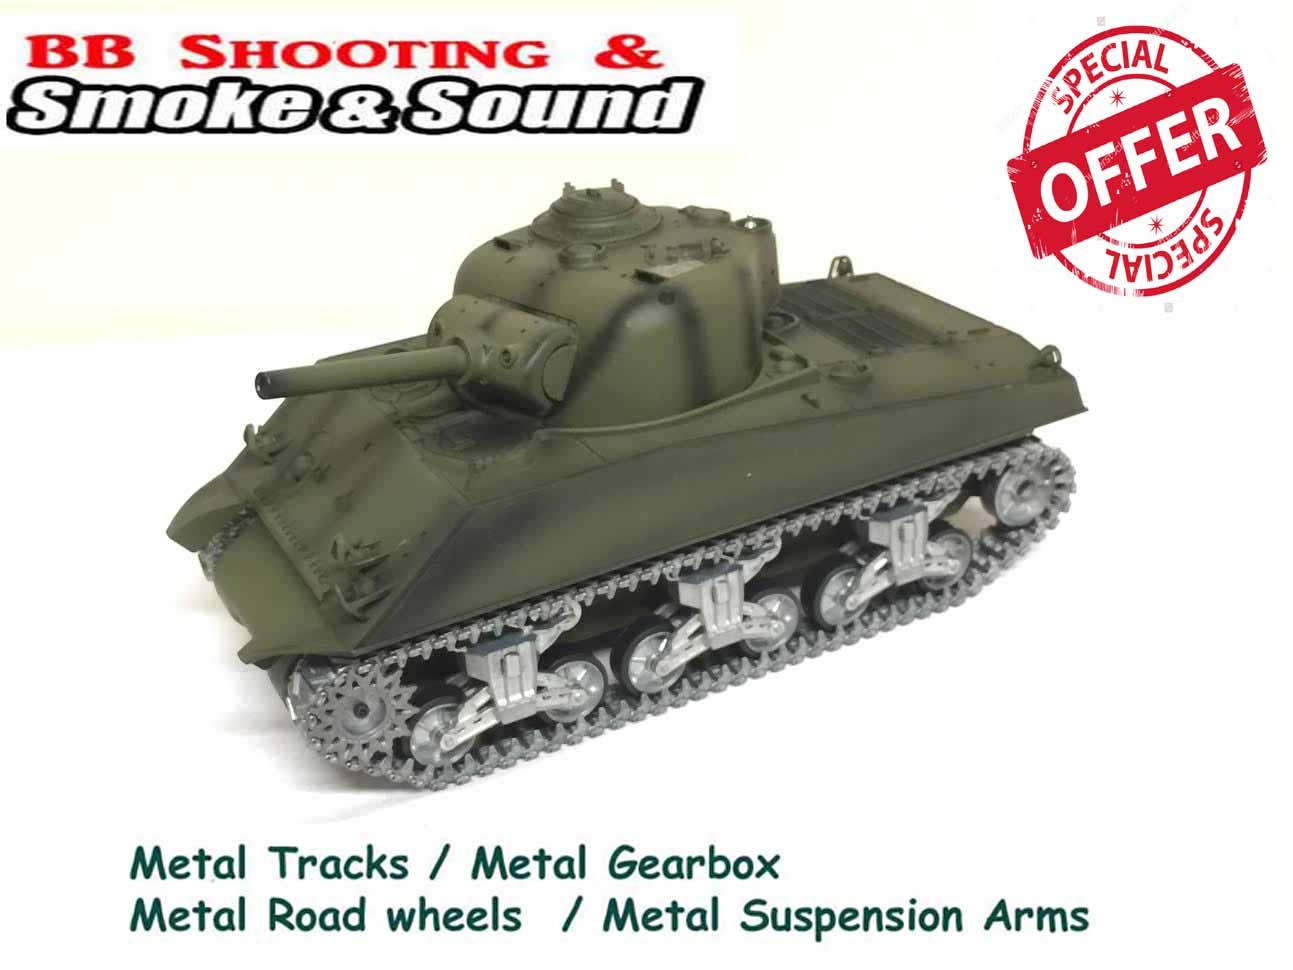 97f4975463f5 Heng Long Sherman M4A3 rc Tank 1 16 PRO with Metal Road Wheels ! 2.4G 5.3  version